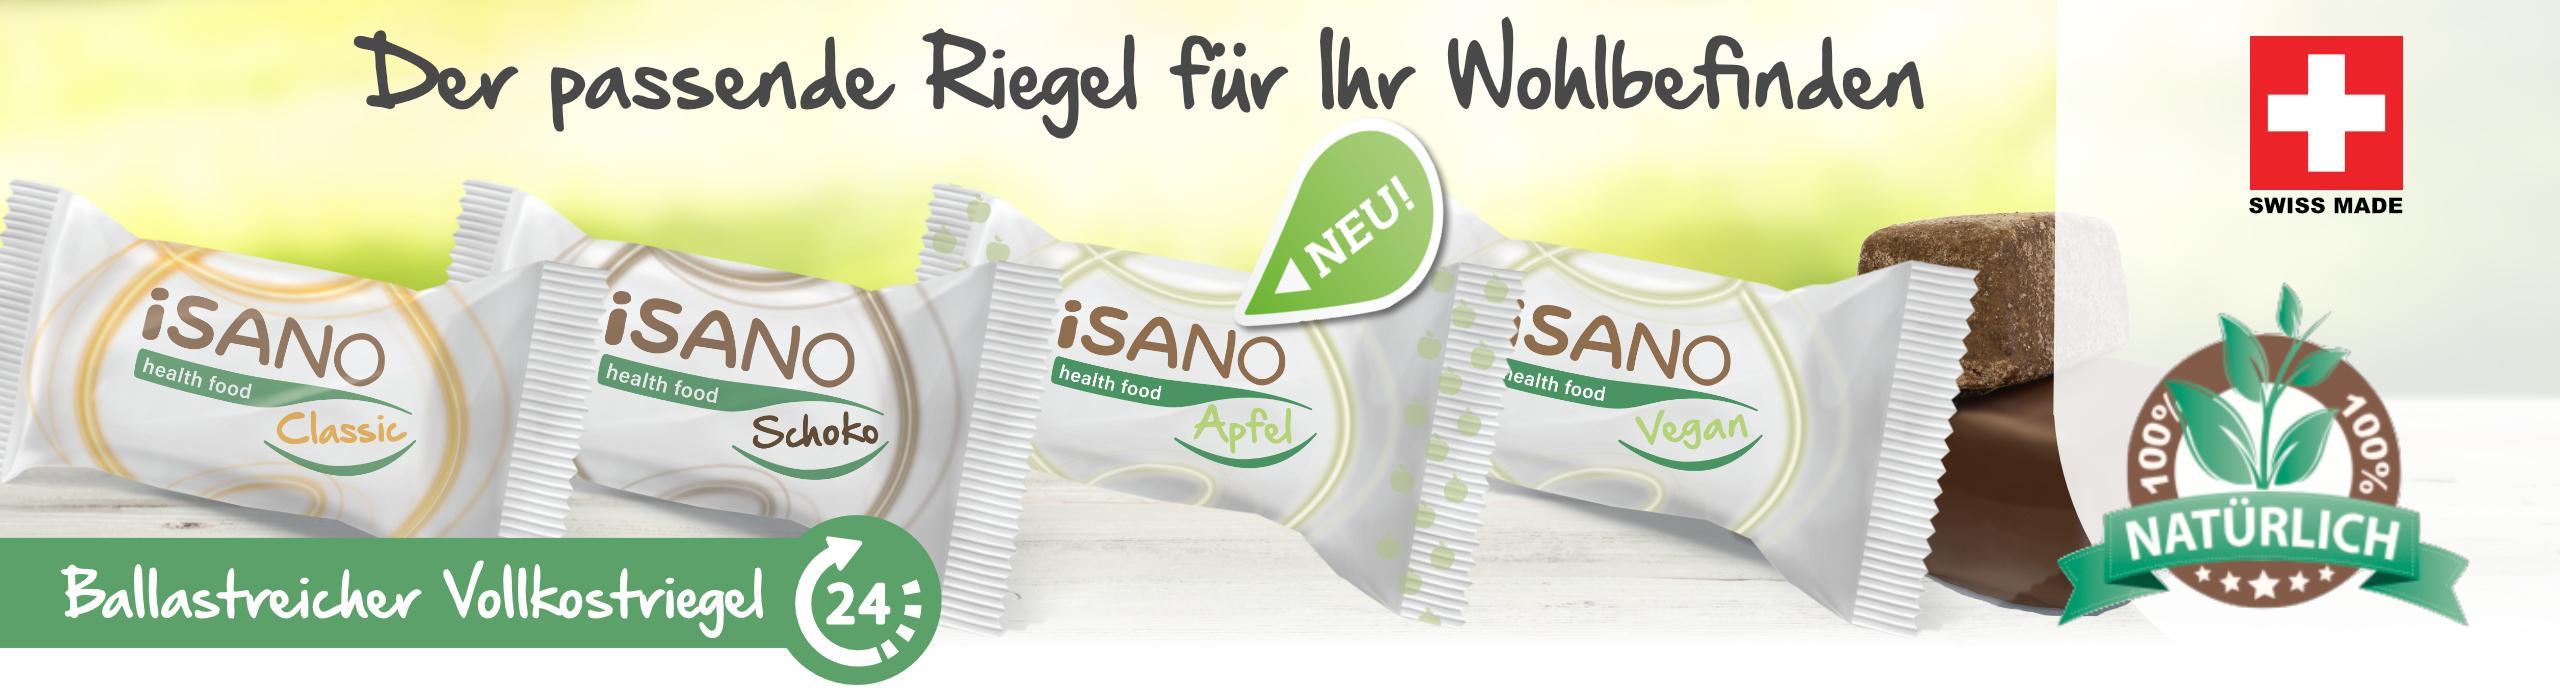 iSano-Banner-Homepage-1